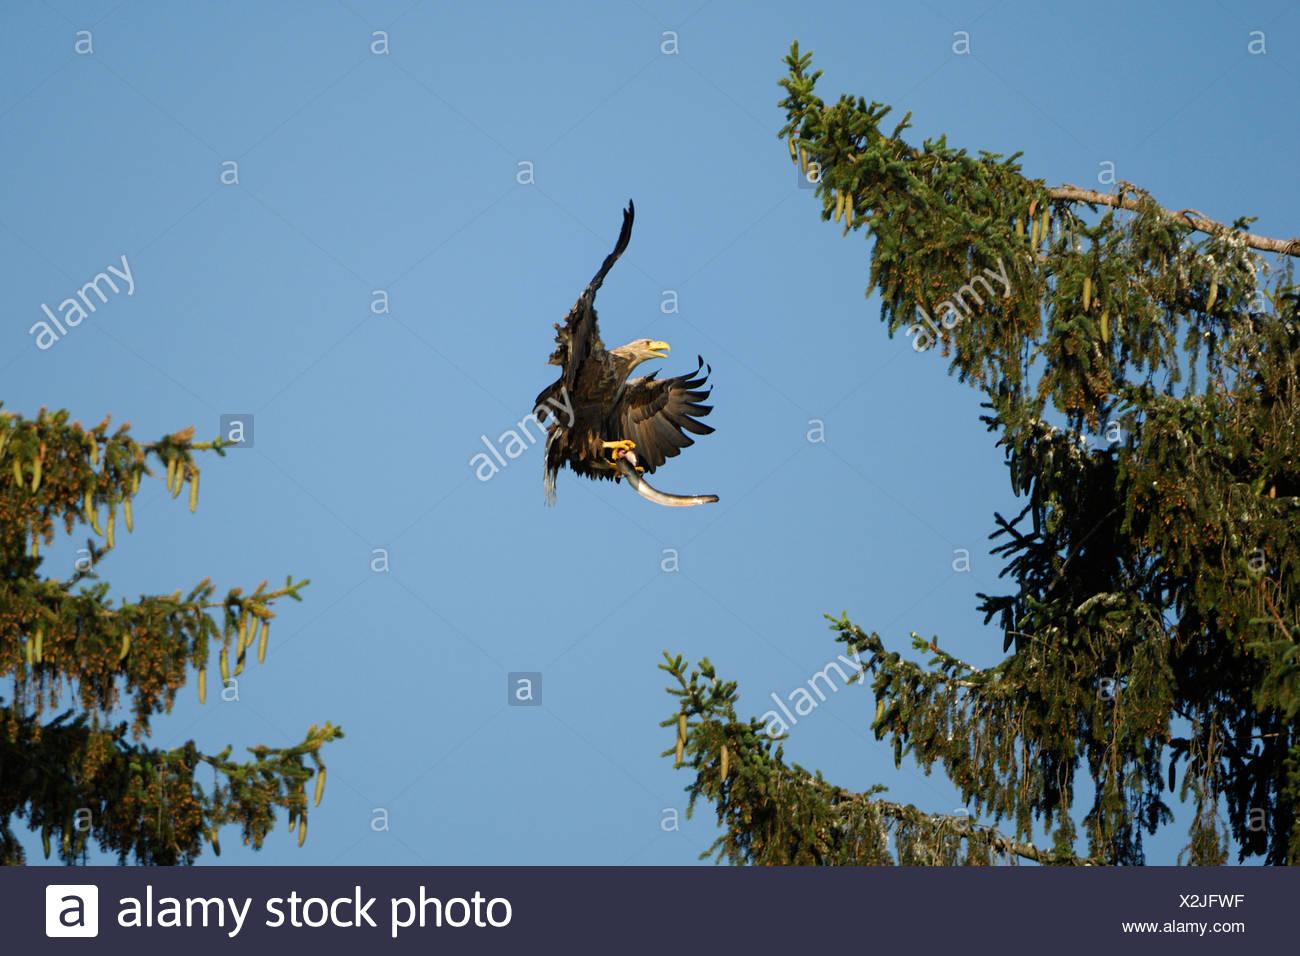 White tailed eagle (Haliaeetus albicilla) in flight with True eels (Anguilliformes) Stock Photo